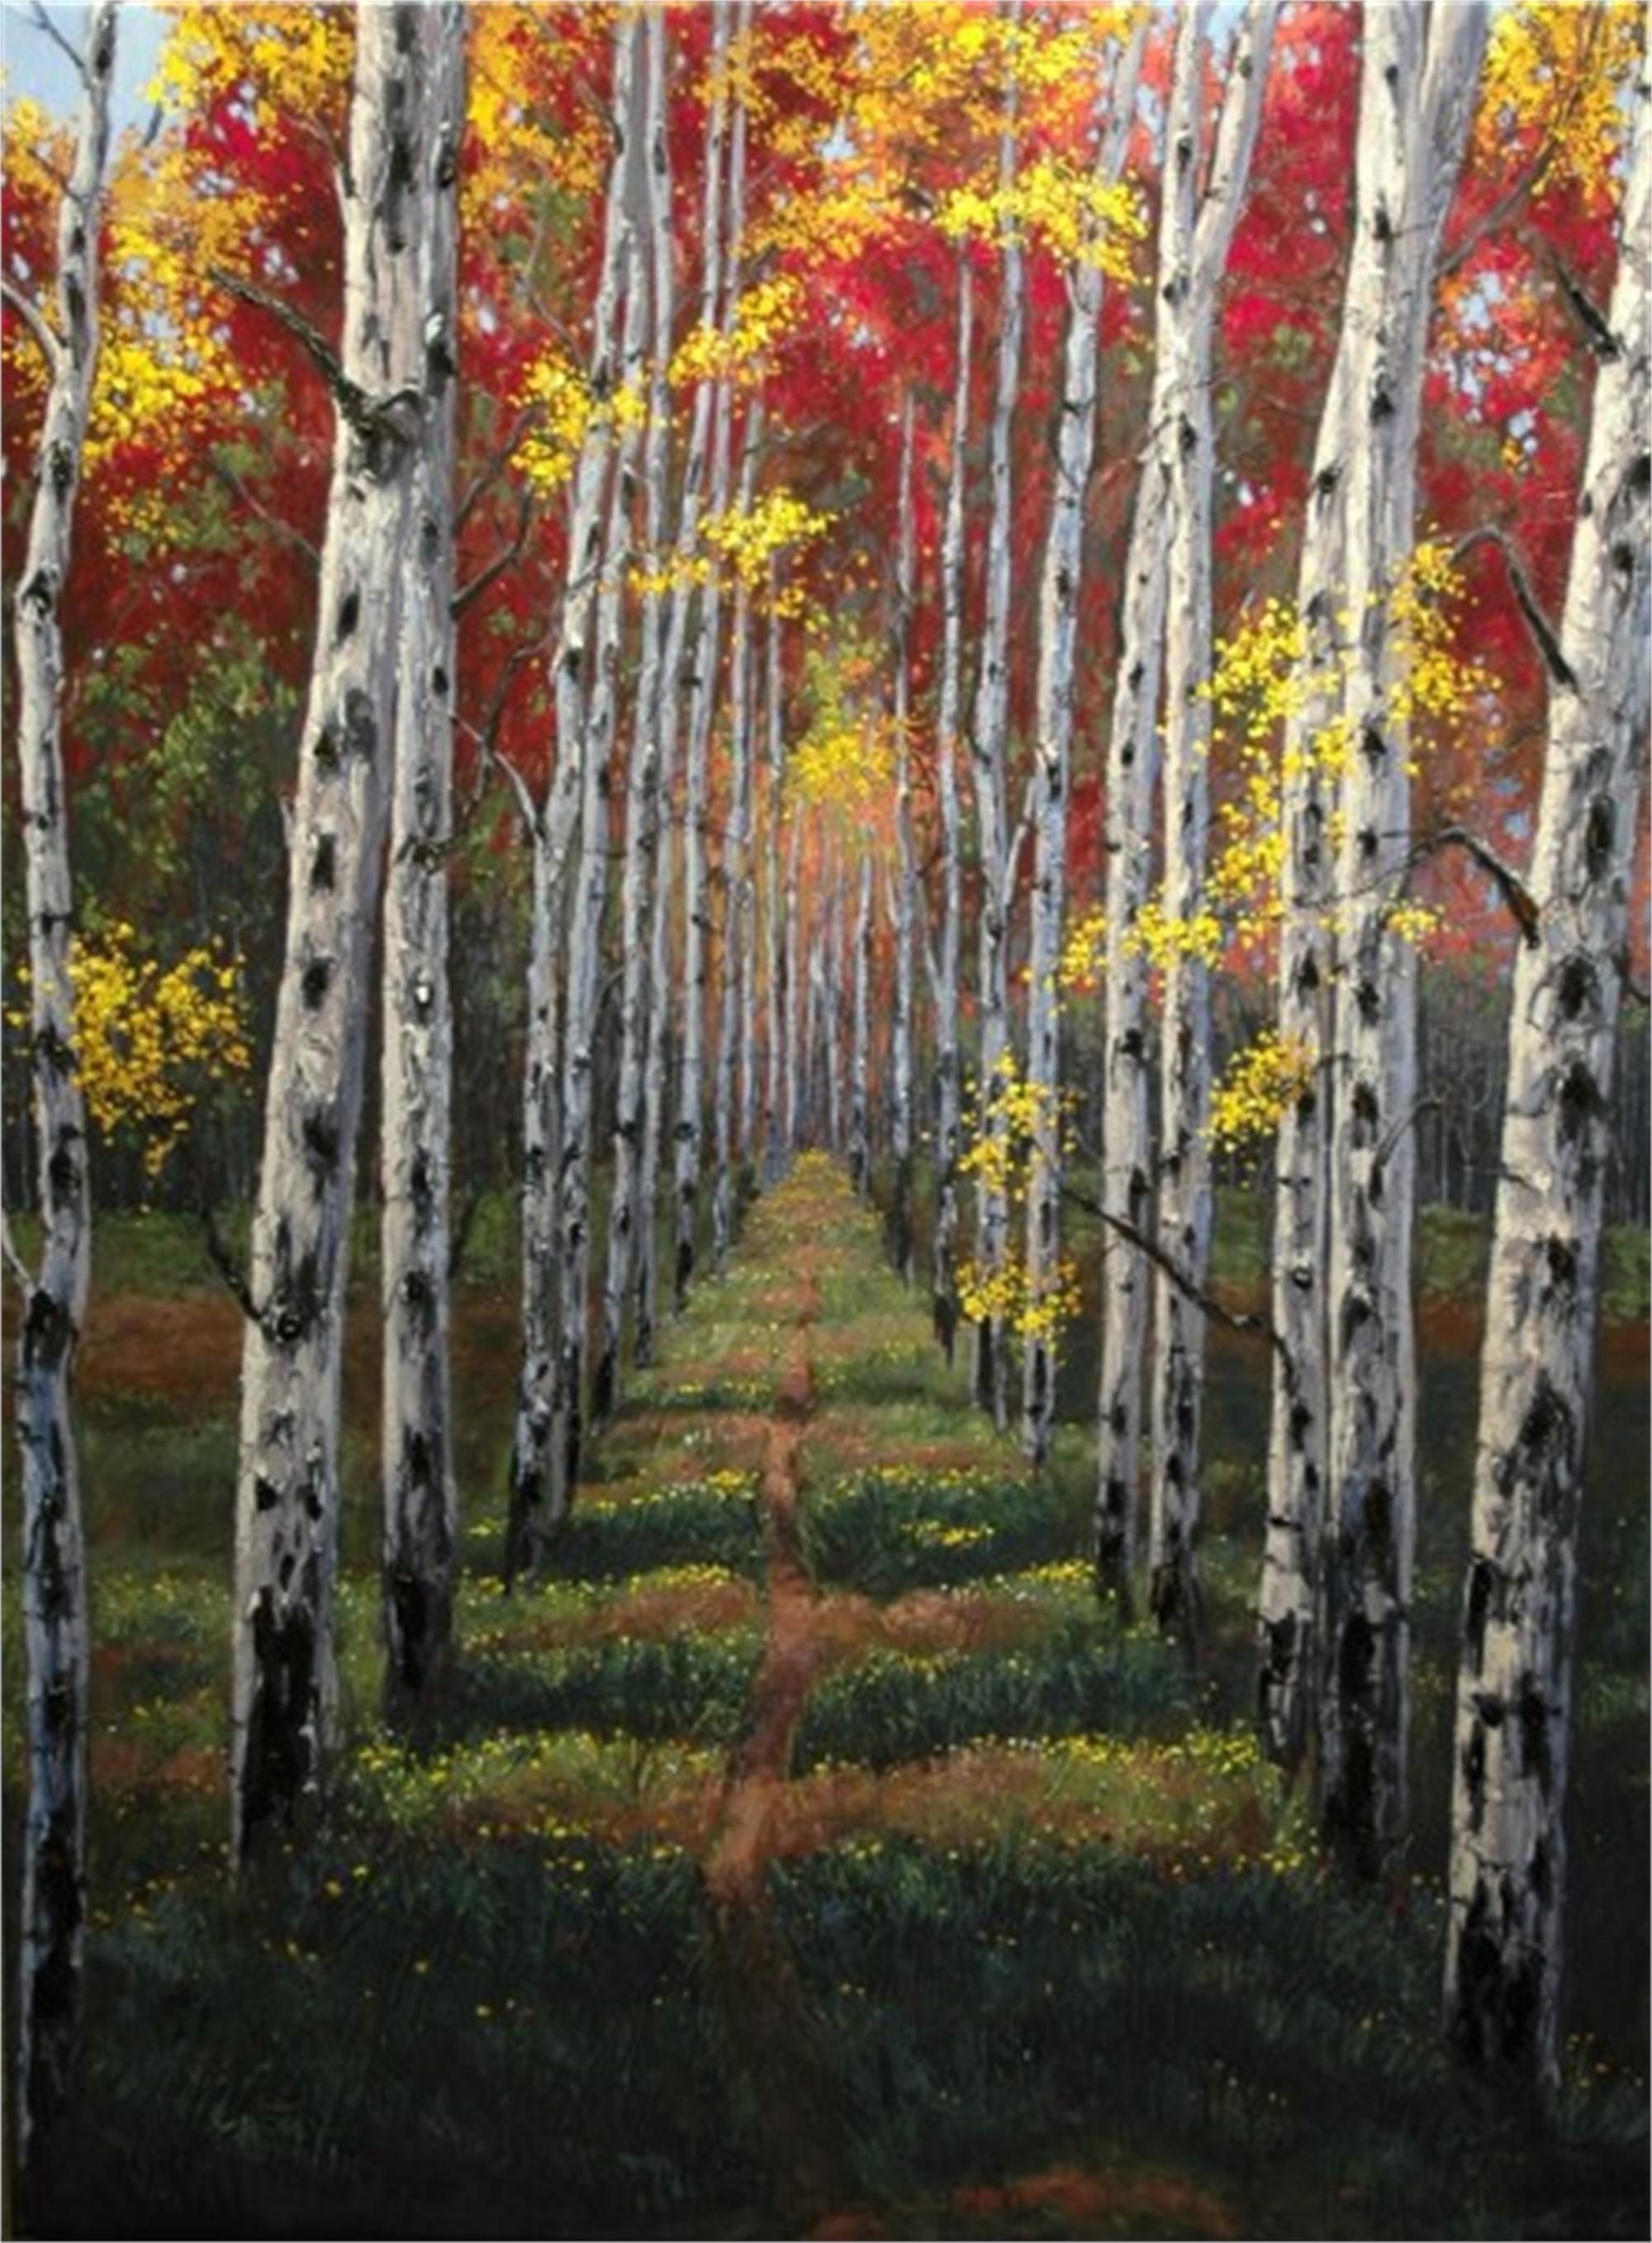 Road Less Traveled by Jennifer Vranes